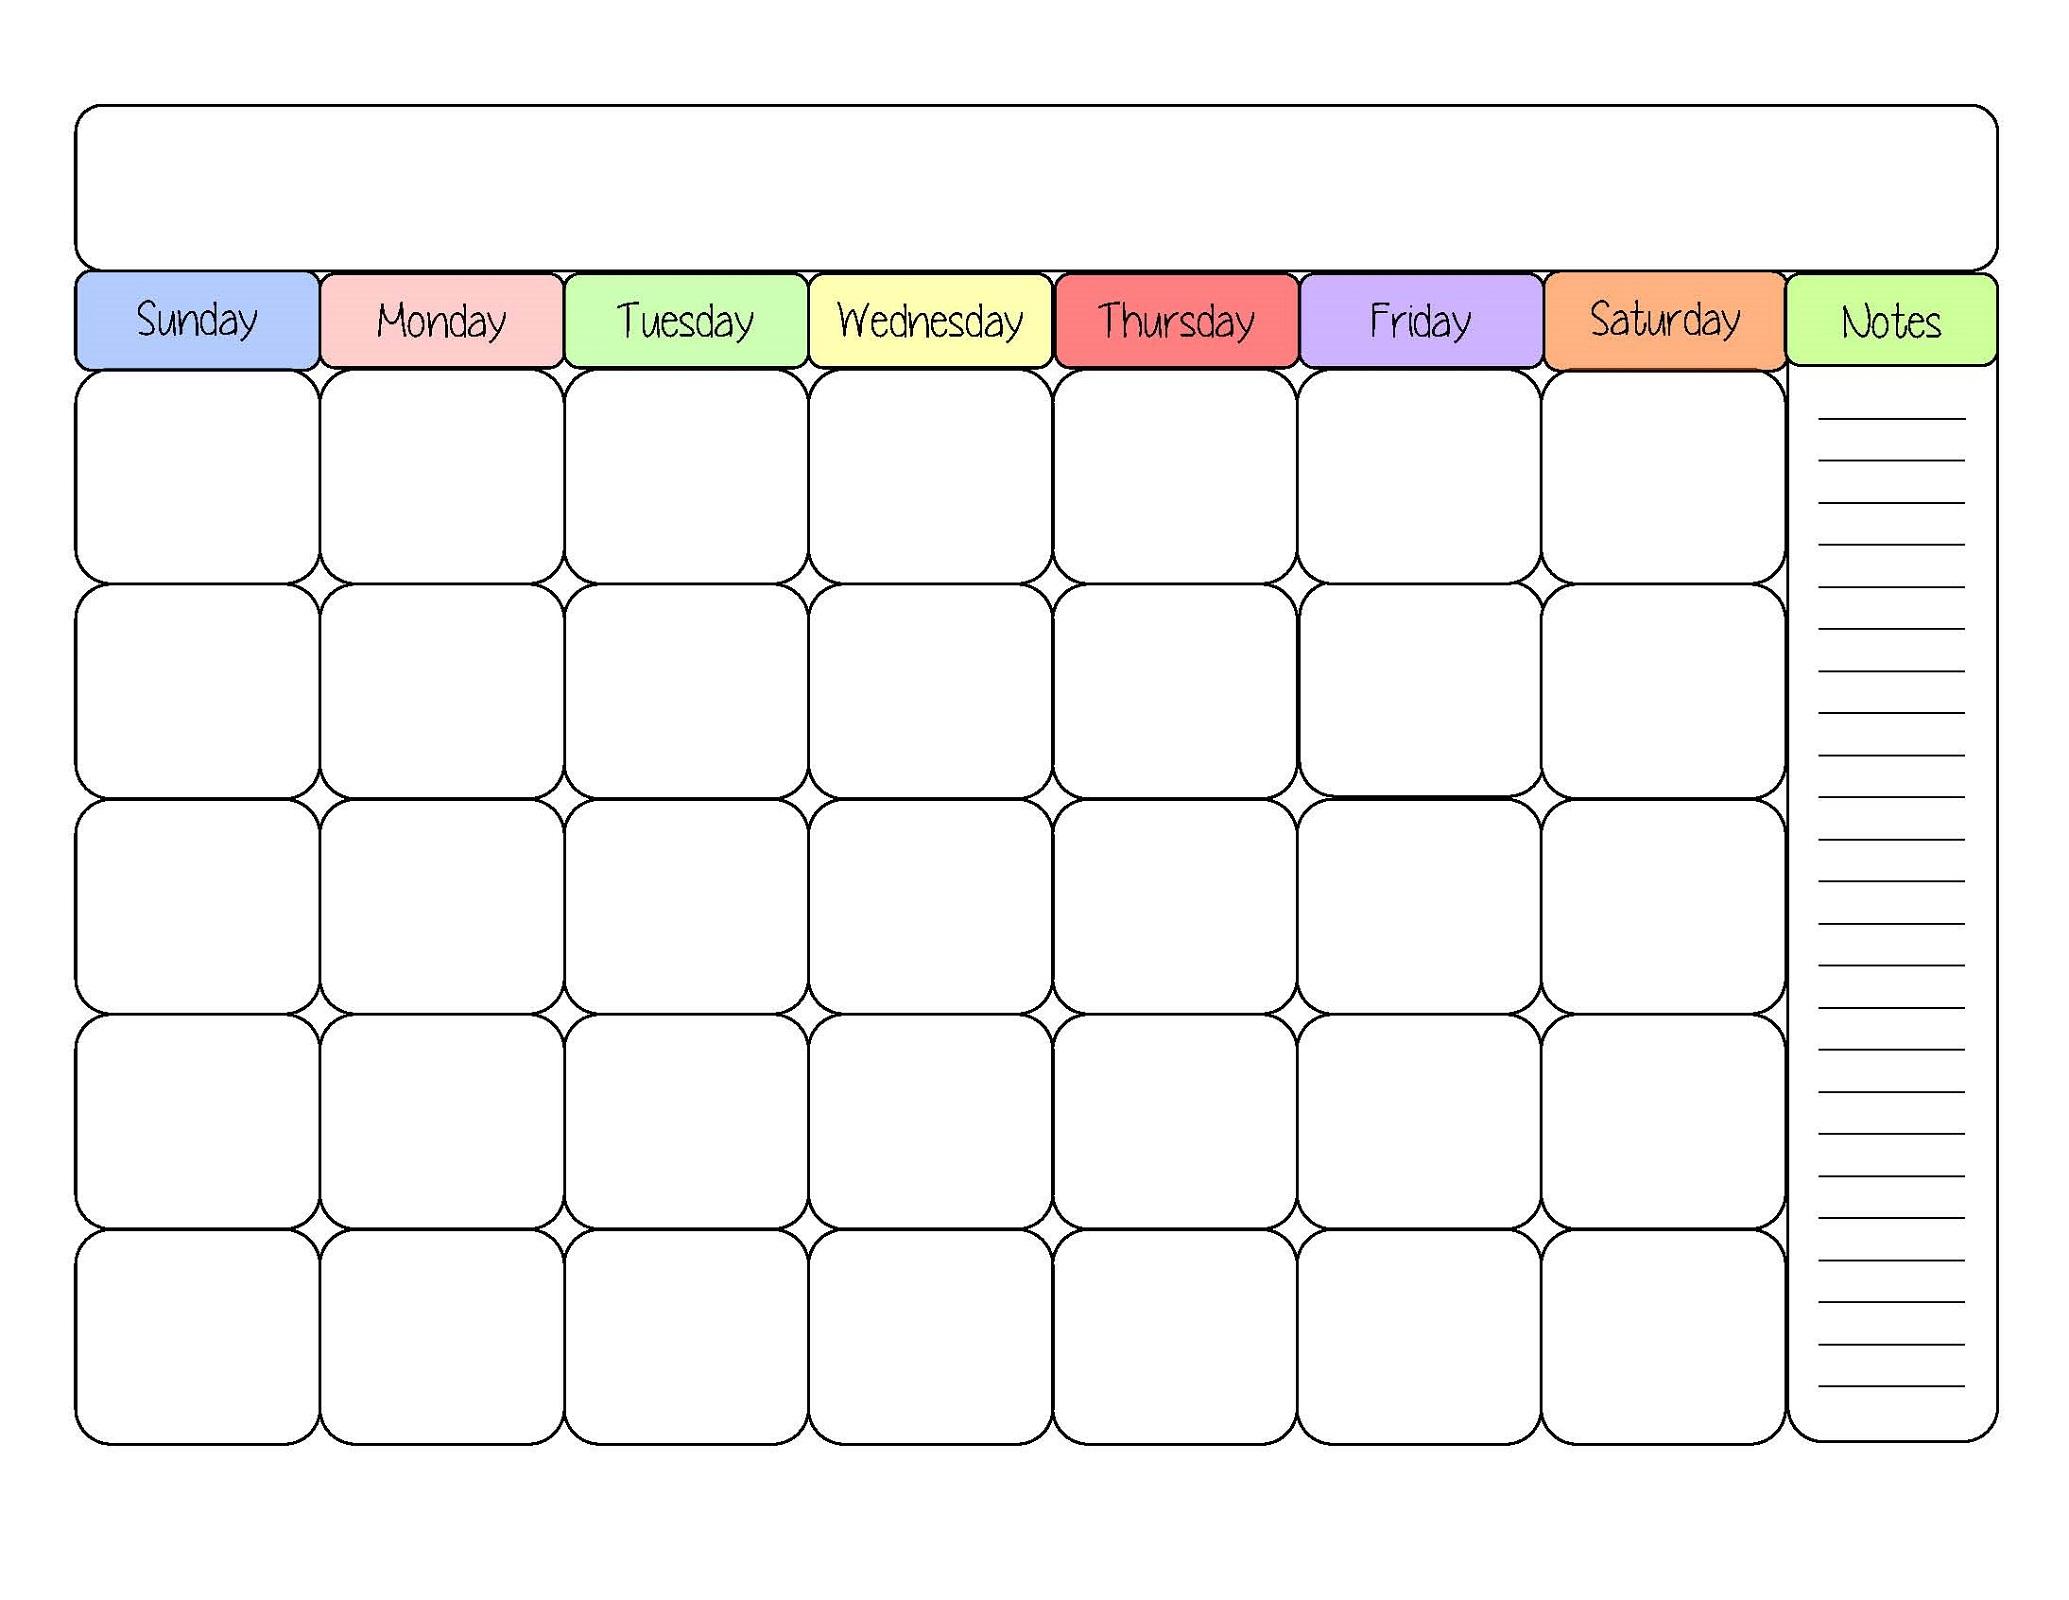 Free Printable Calendar Templates | Activity Shelter for Blank Printable Calendar Free